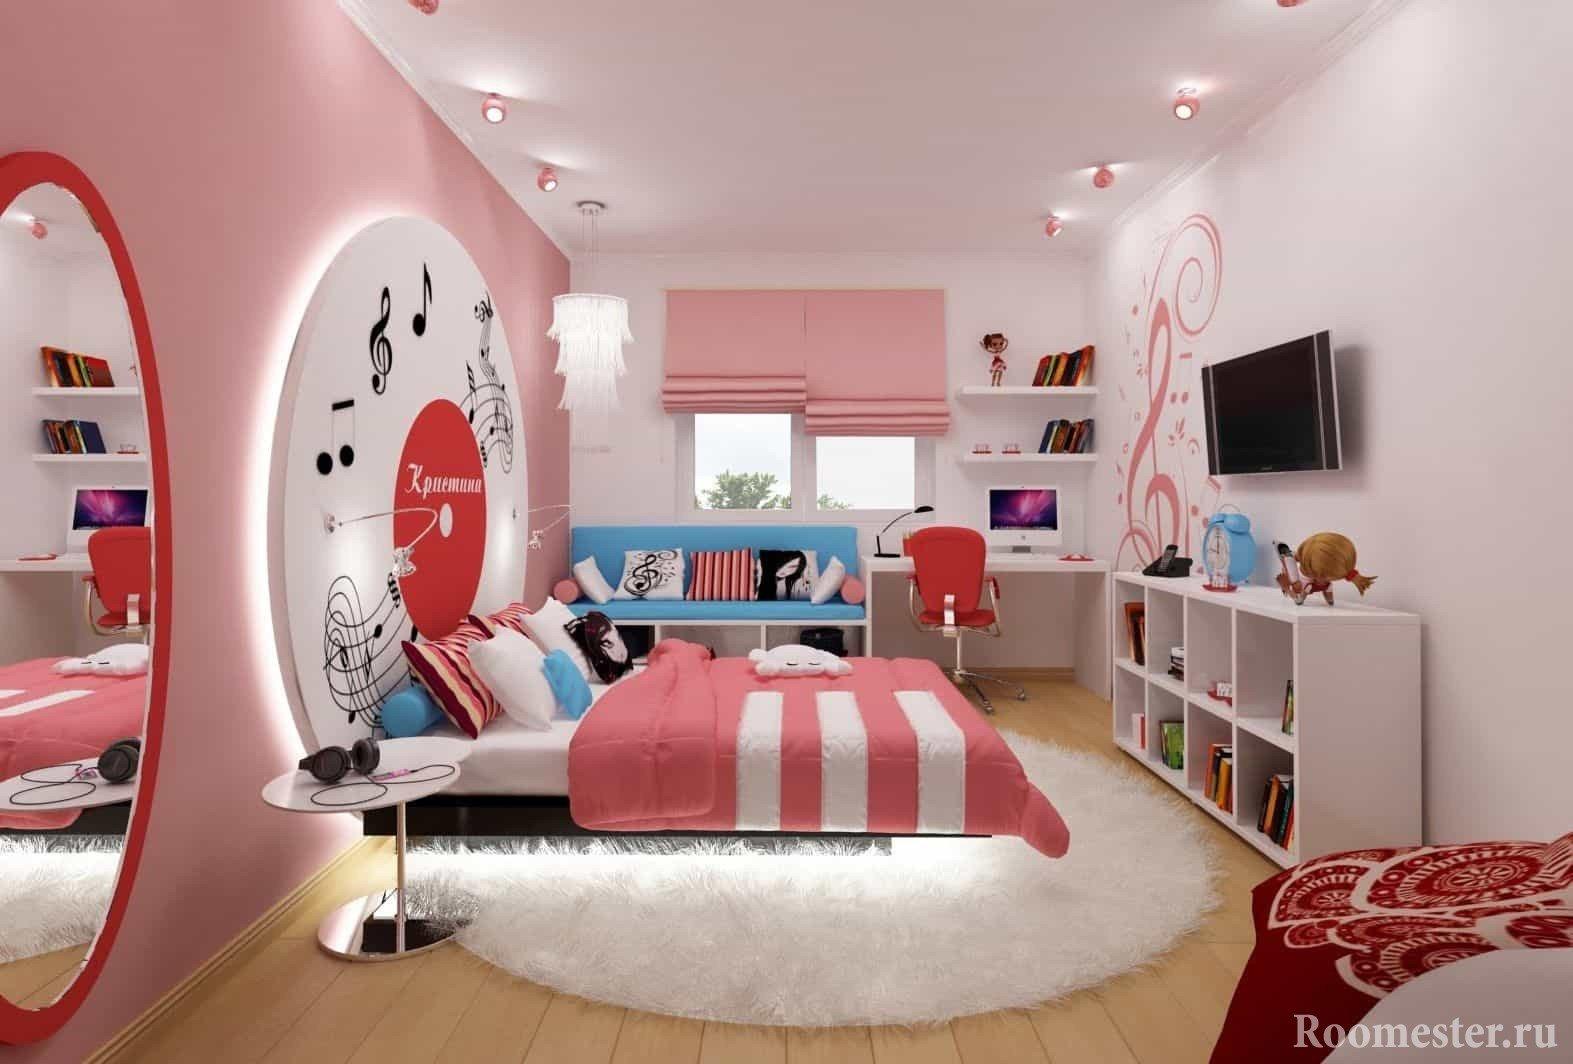 Kinderzimmer Ideen Rosa